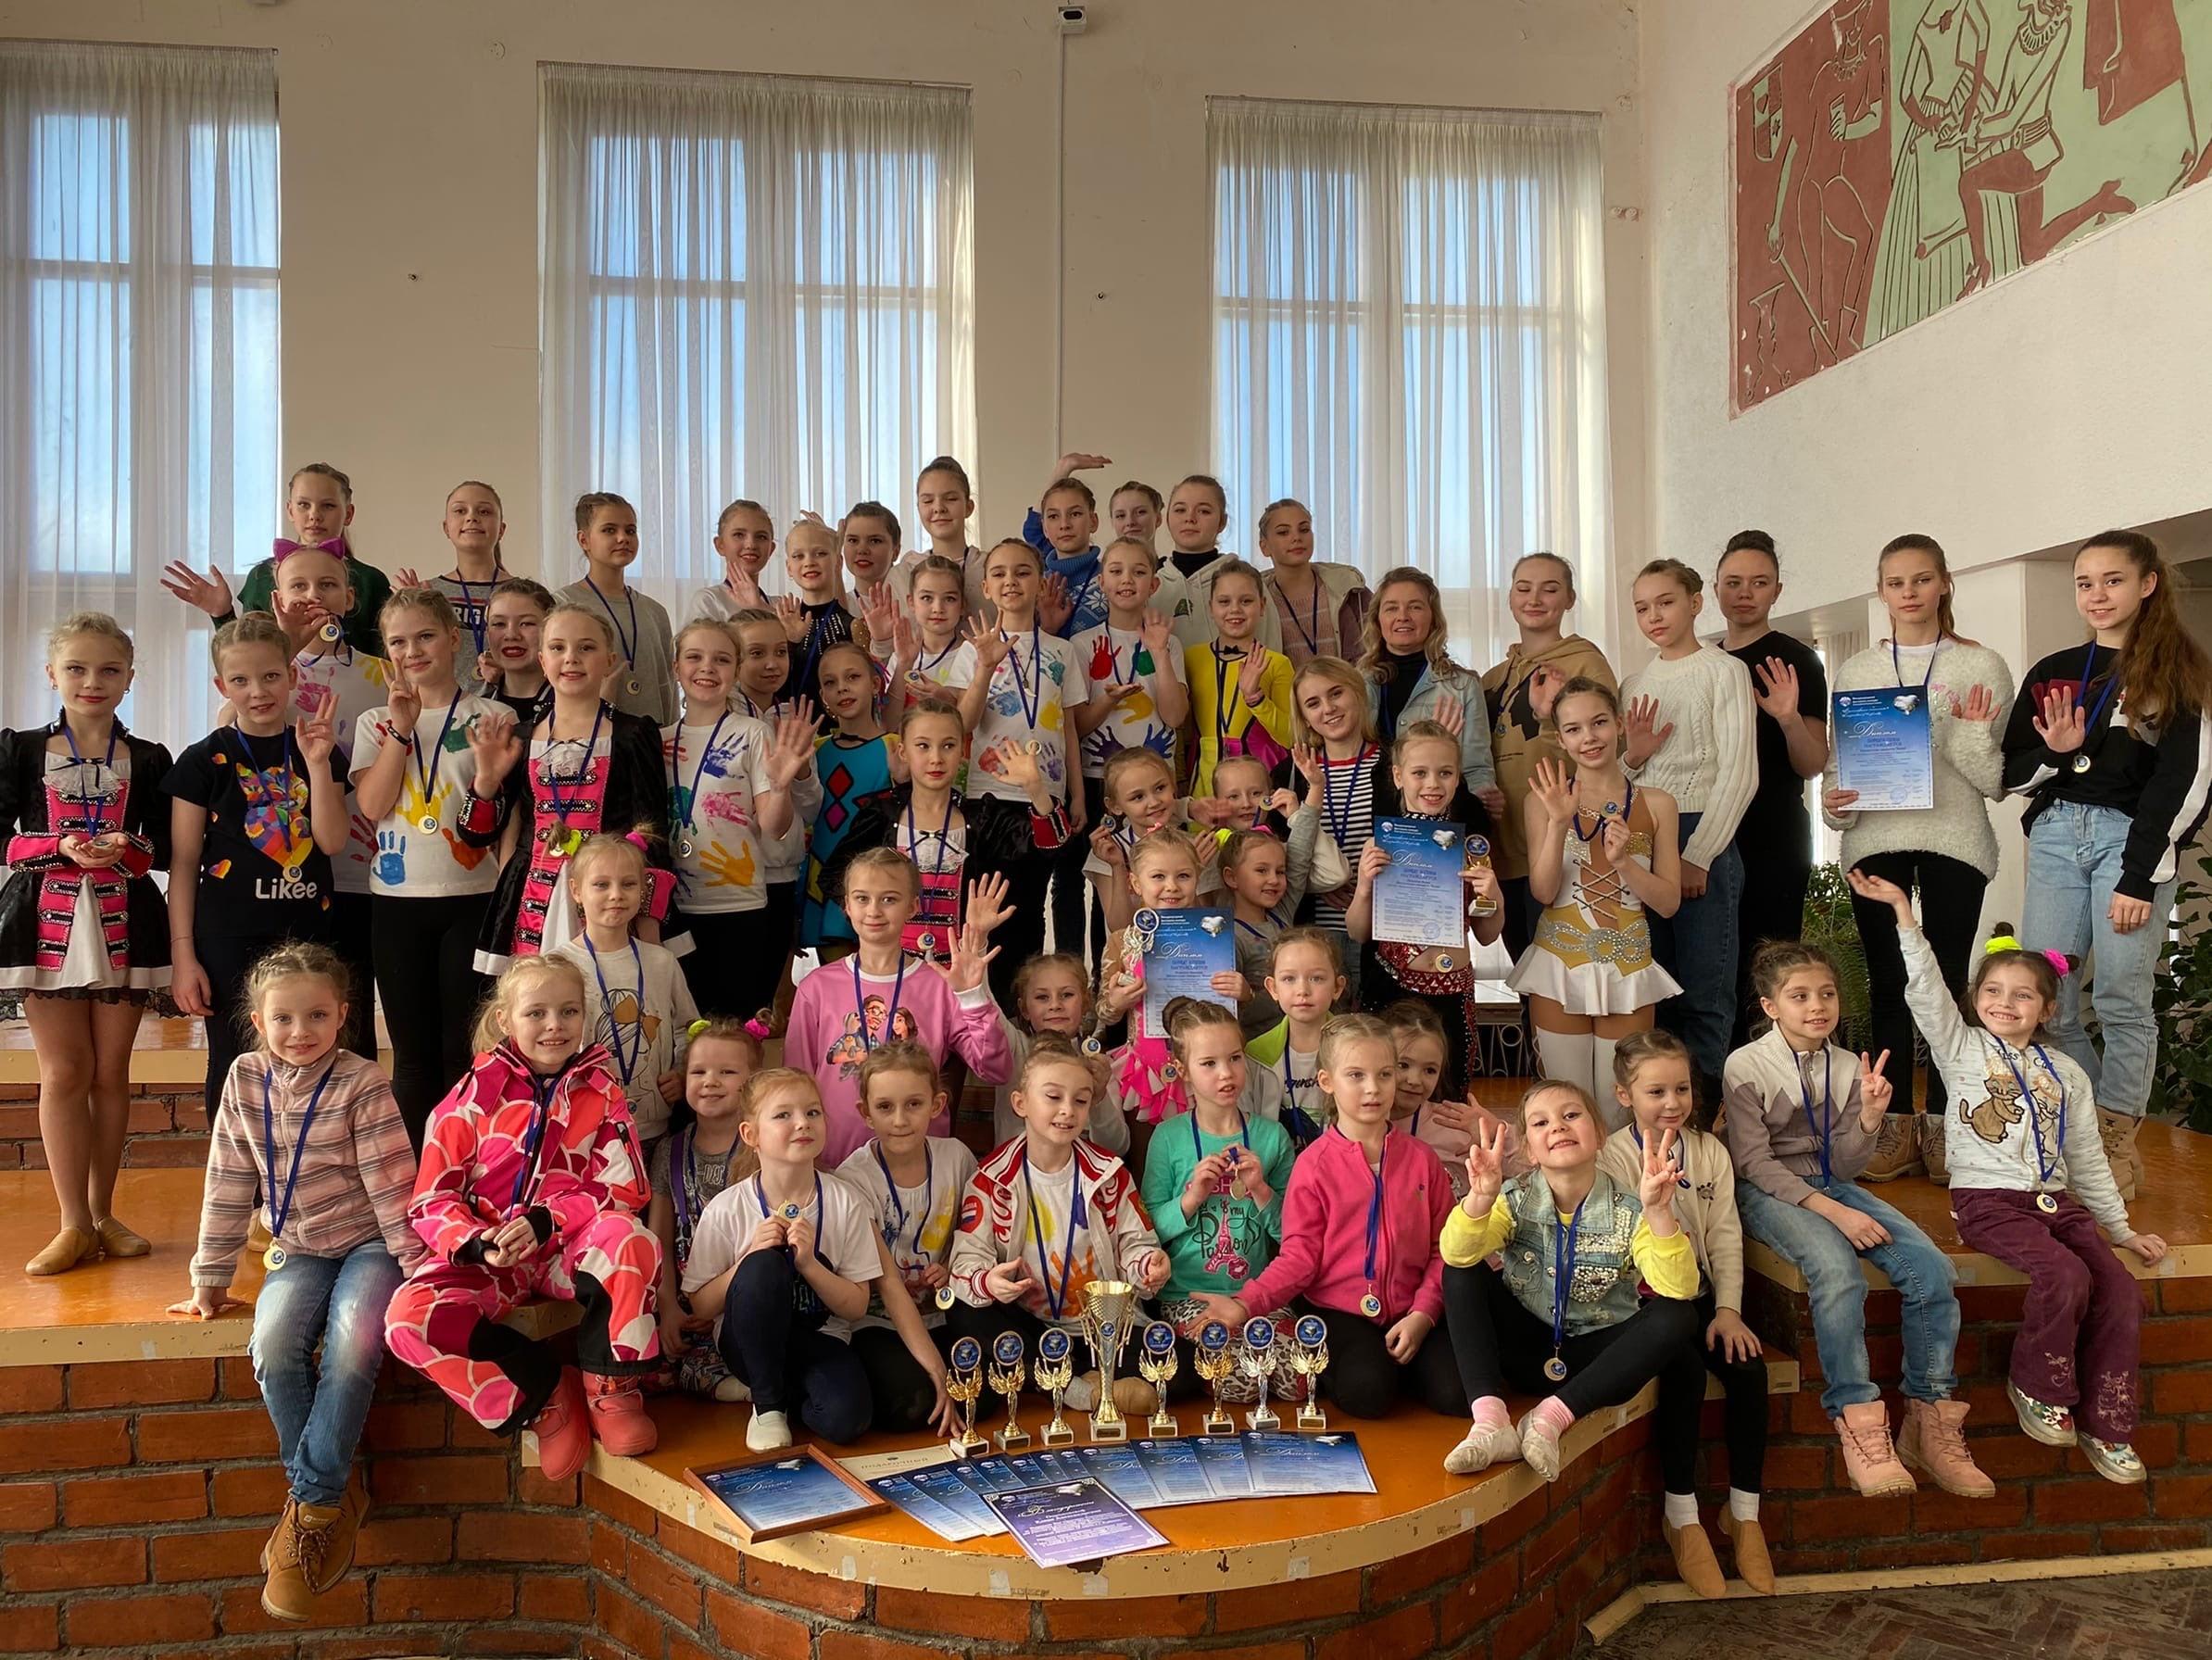 Кимрские мажоретки стали лучшими на международном конкурсе